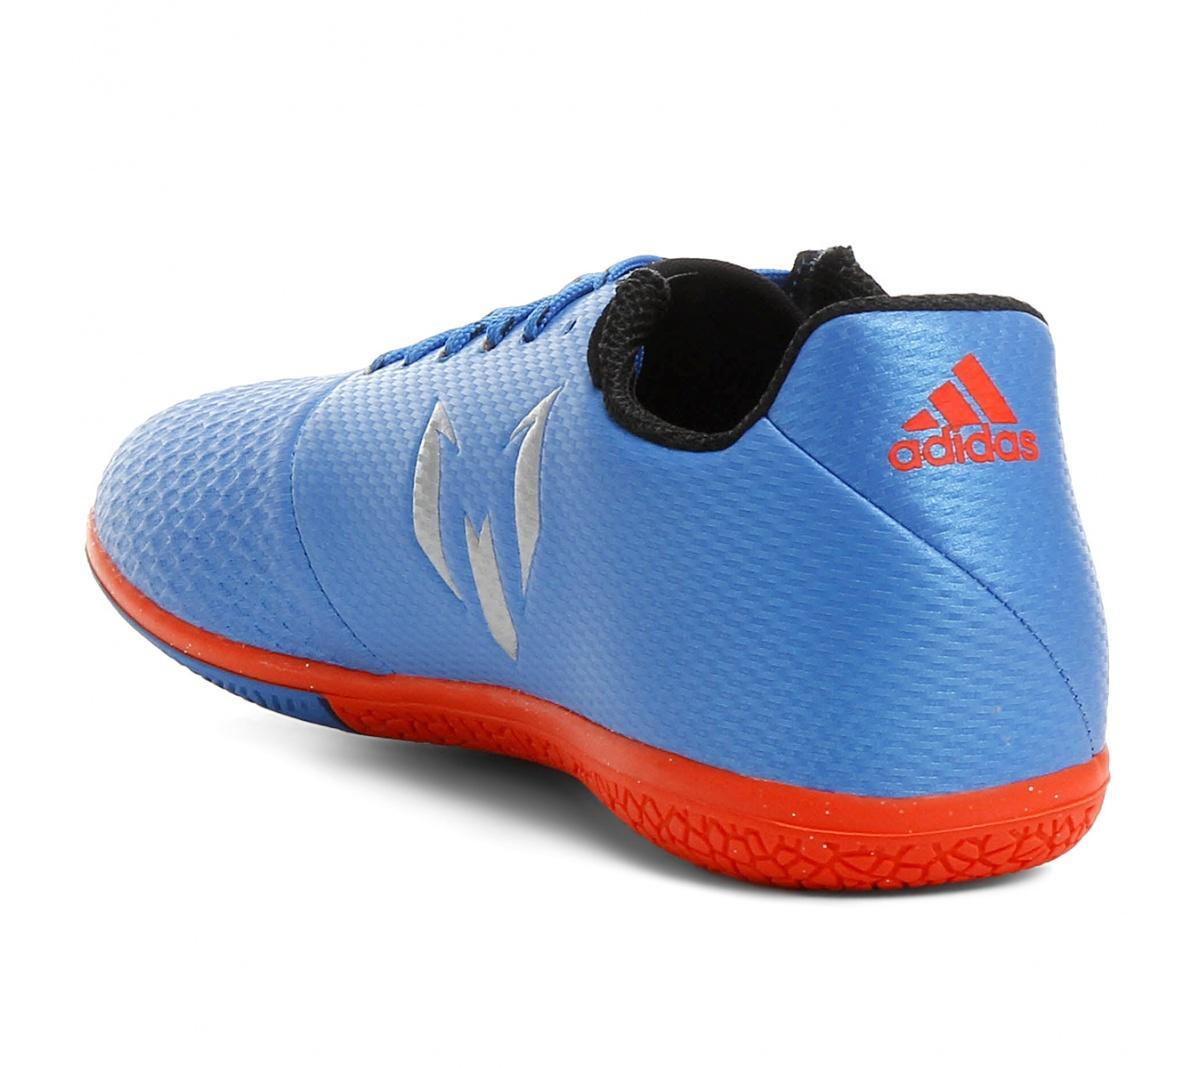 Tênis Adidas Messi 16.3 Futsal Infantil Az - Mundo do Futebol a441aac7a9430